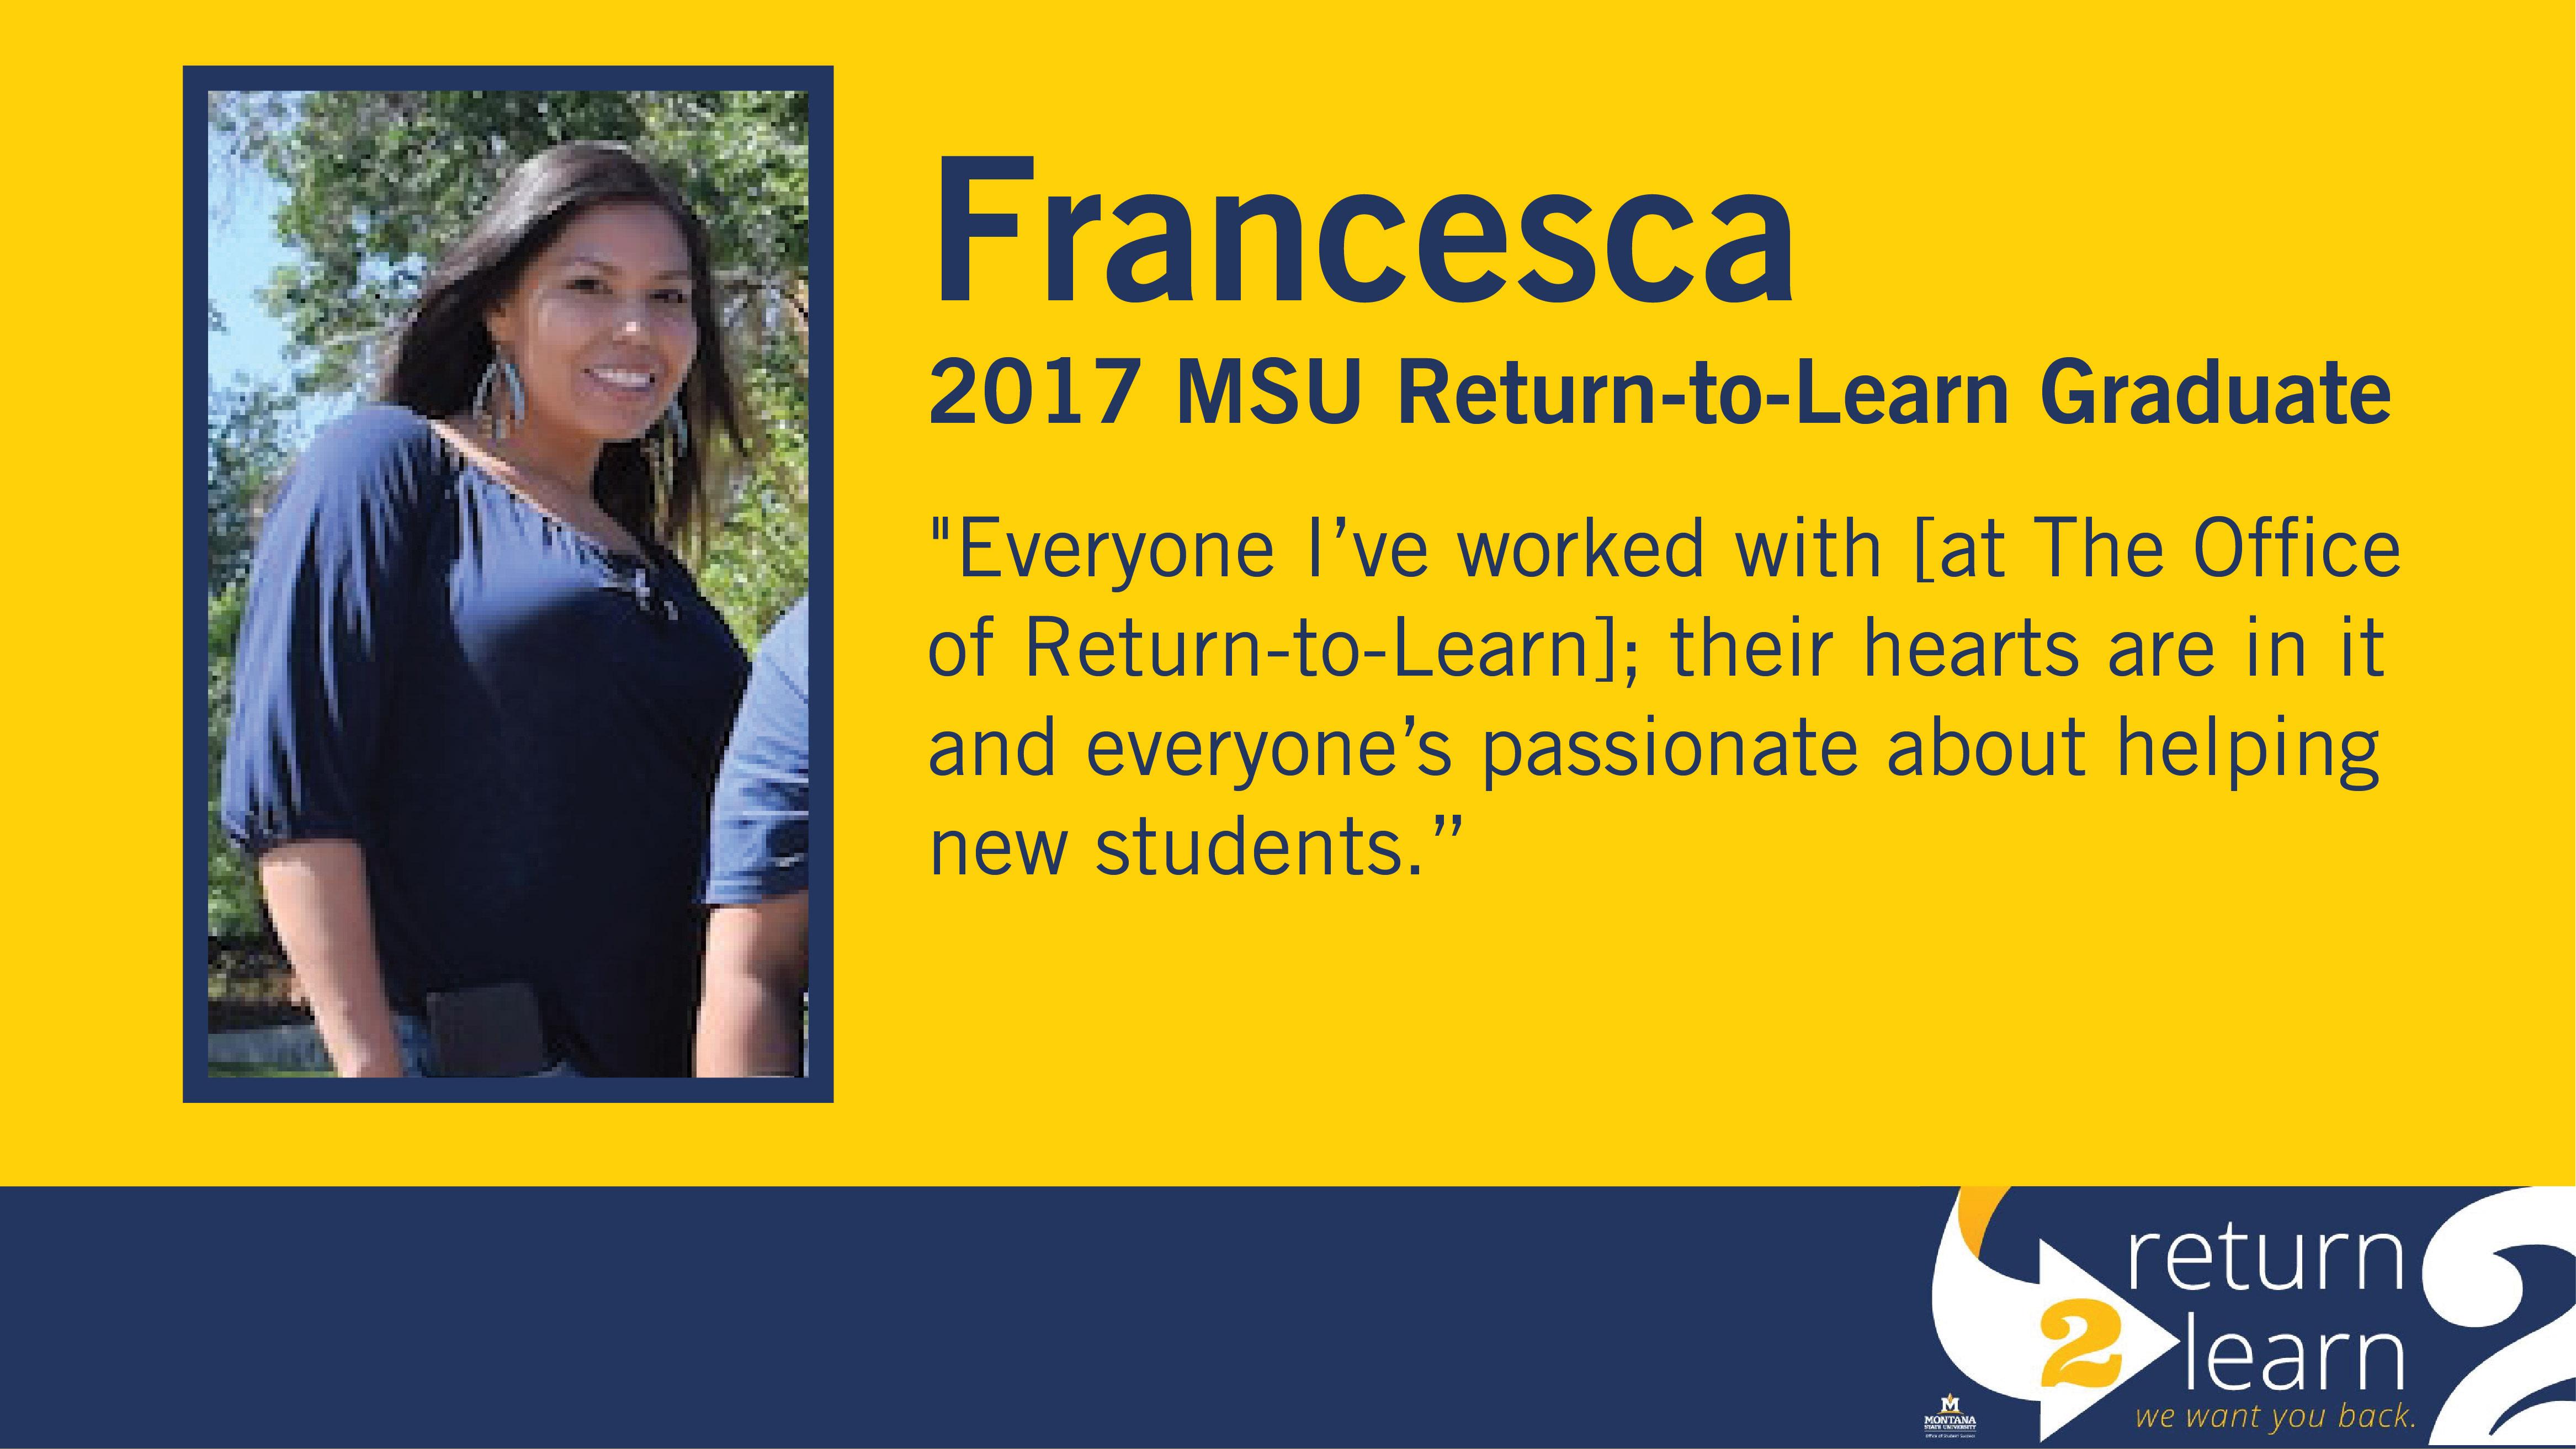 Francesca, 2017 MSU Return-to-Learn Graduate